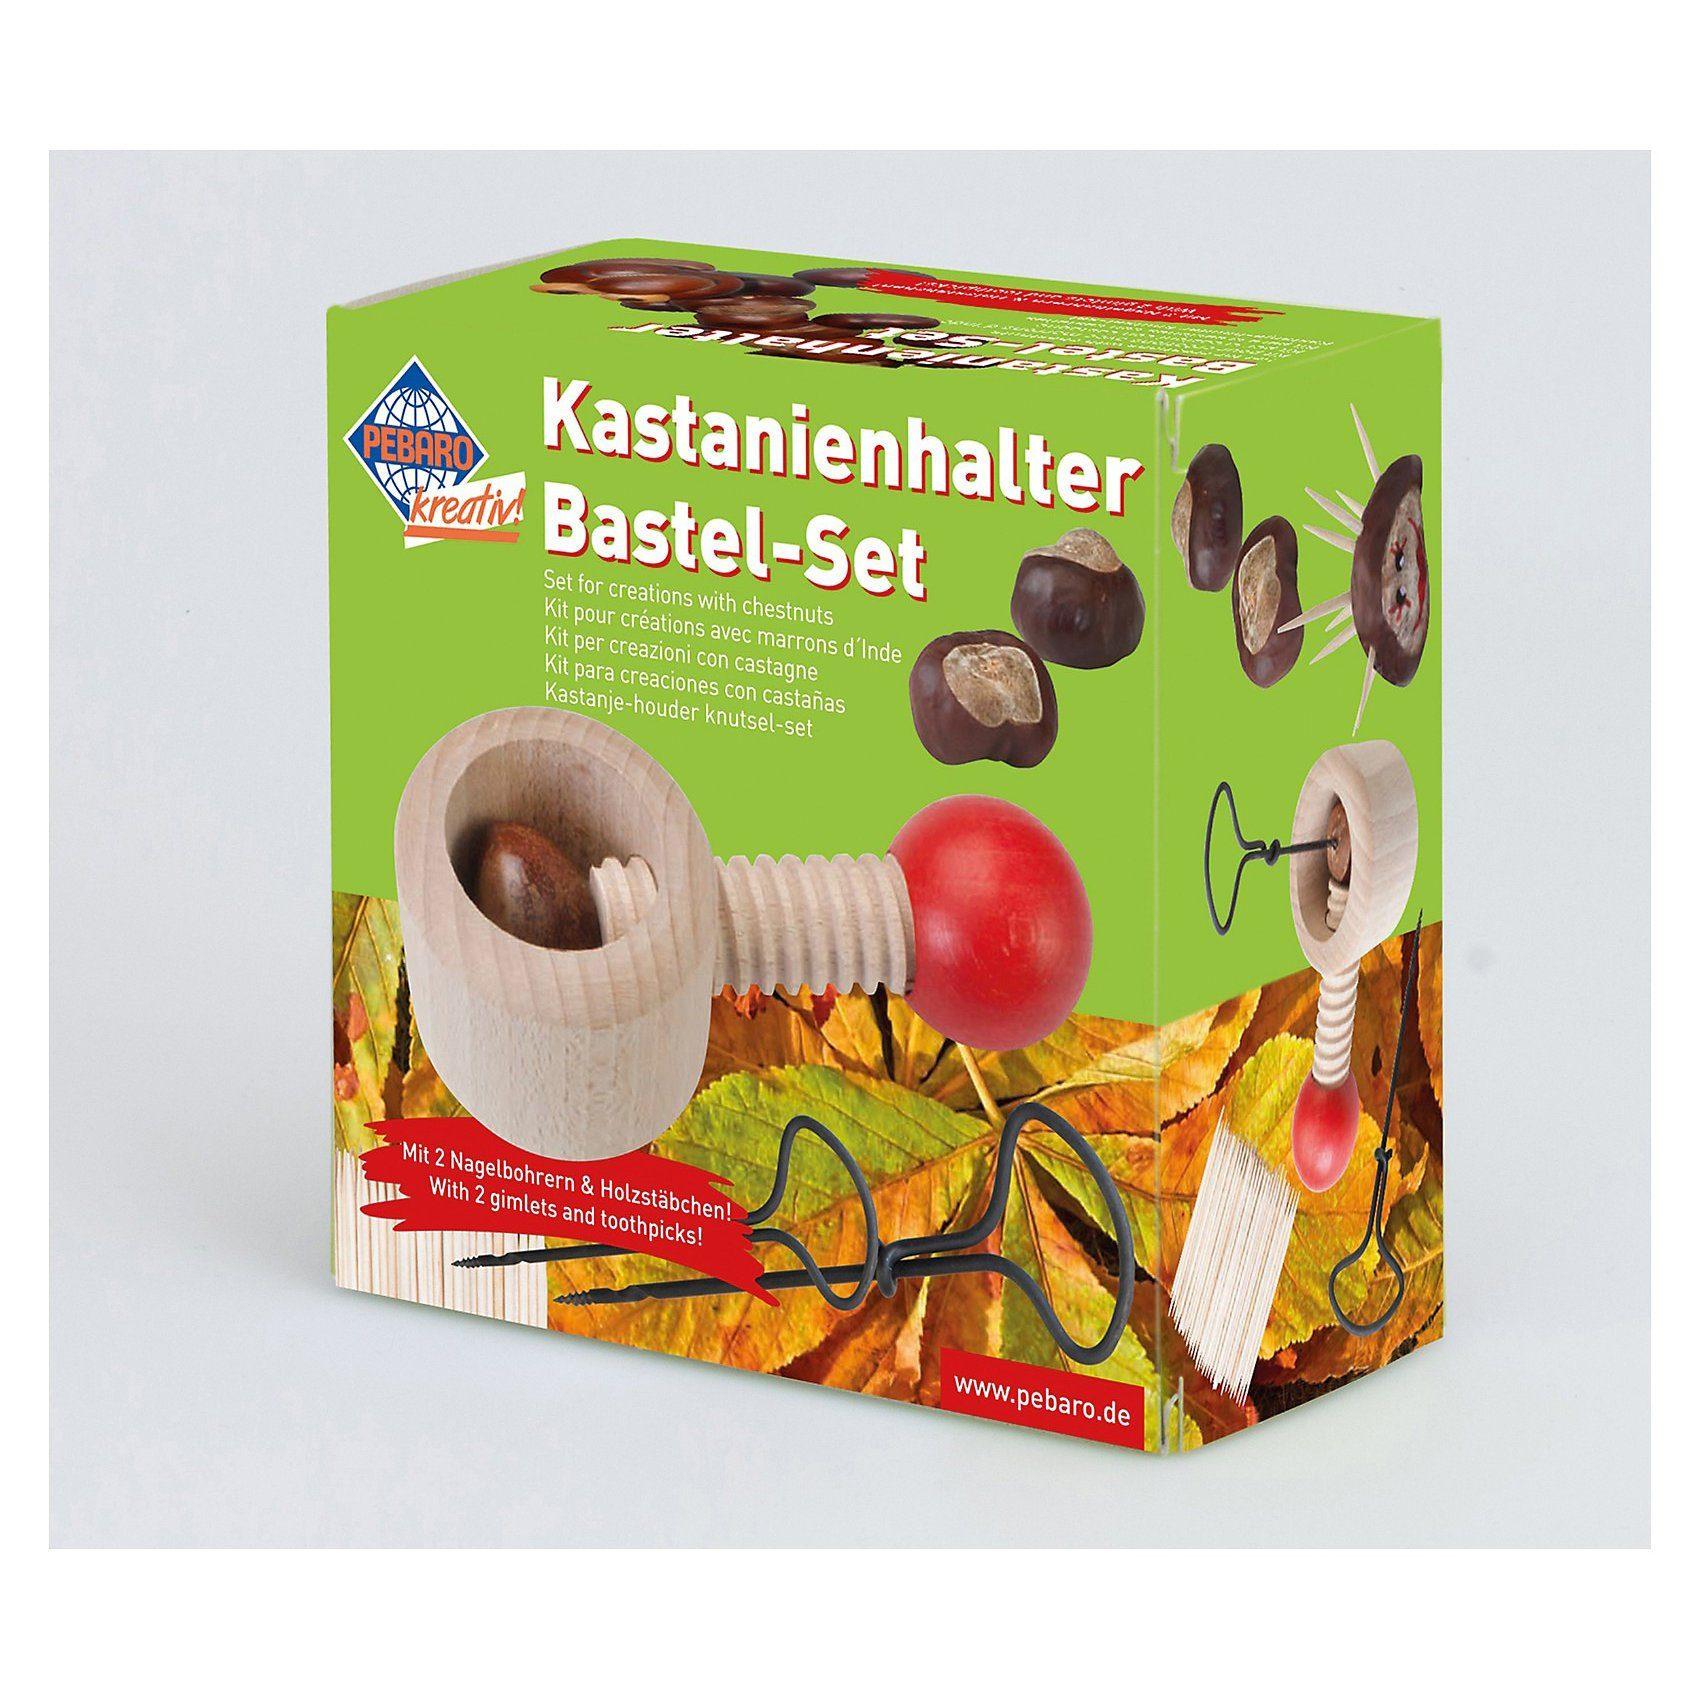 Pebaro Kastanienhalter / Kastanienbohrer Bastel-Set